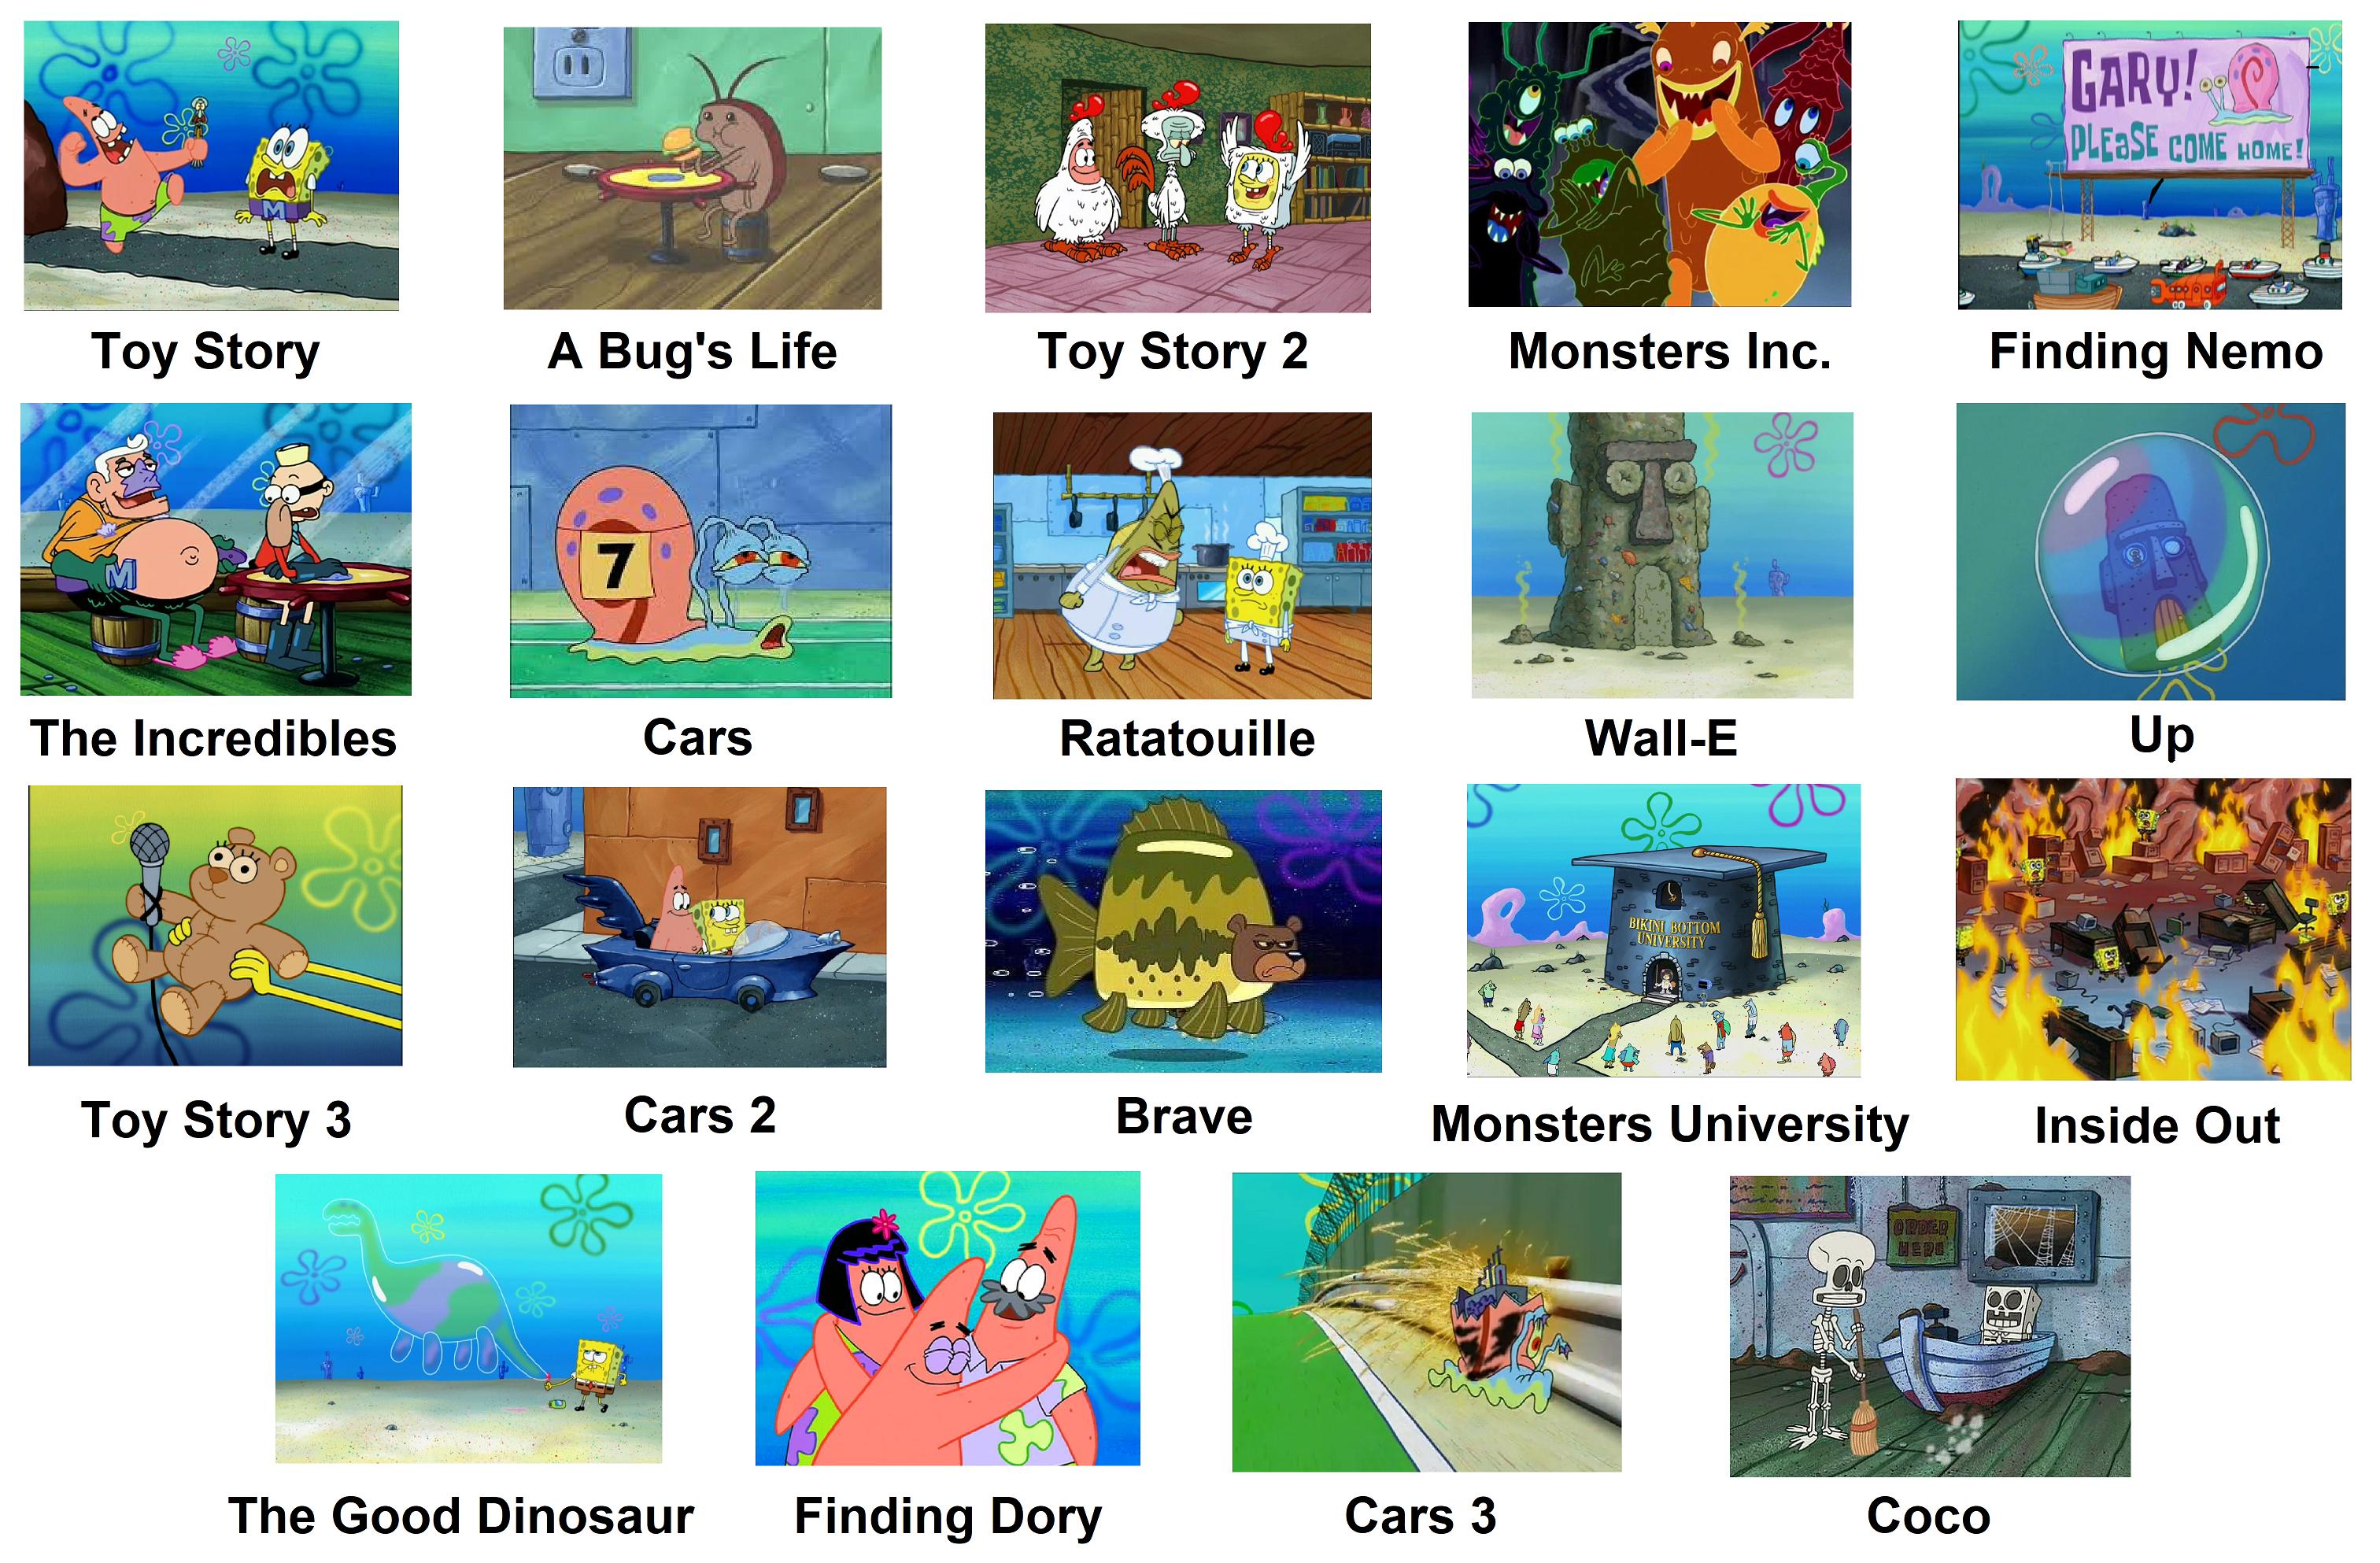 spongebob diamonds meme